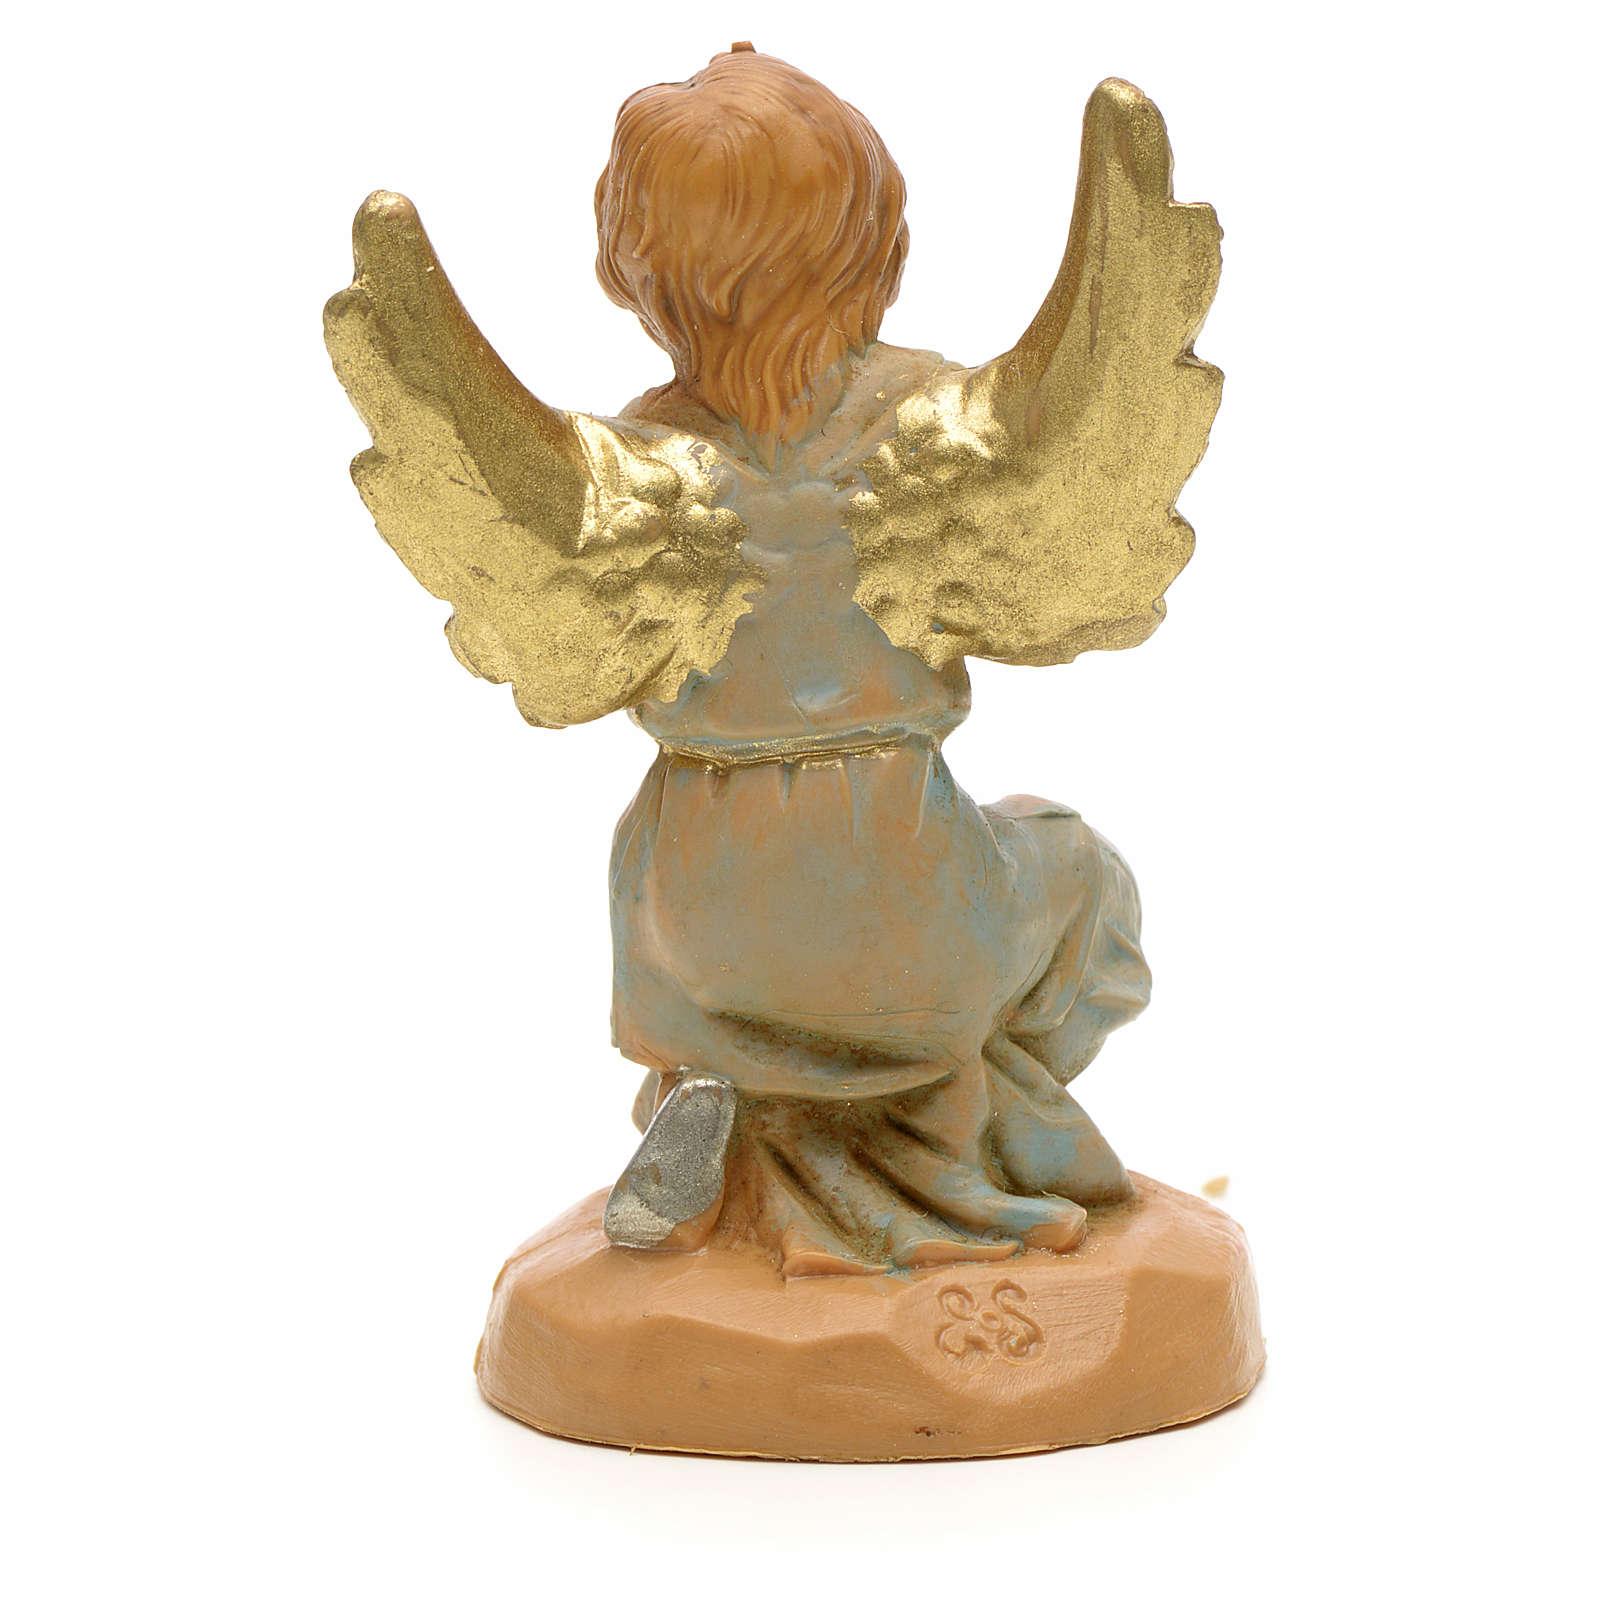 Figur auf den Knien,Engel 6,5 cm Fontanini. 3